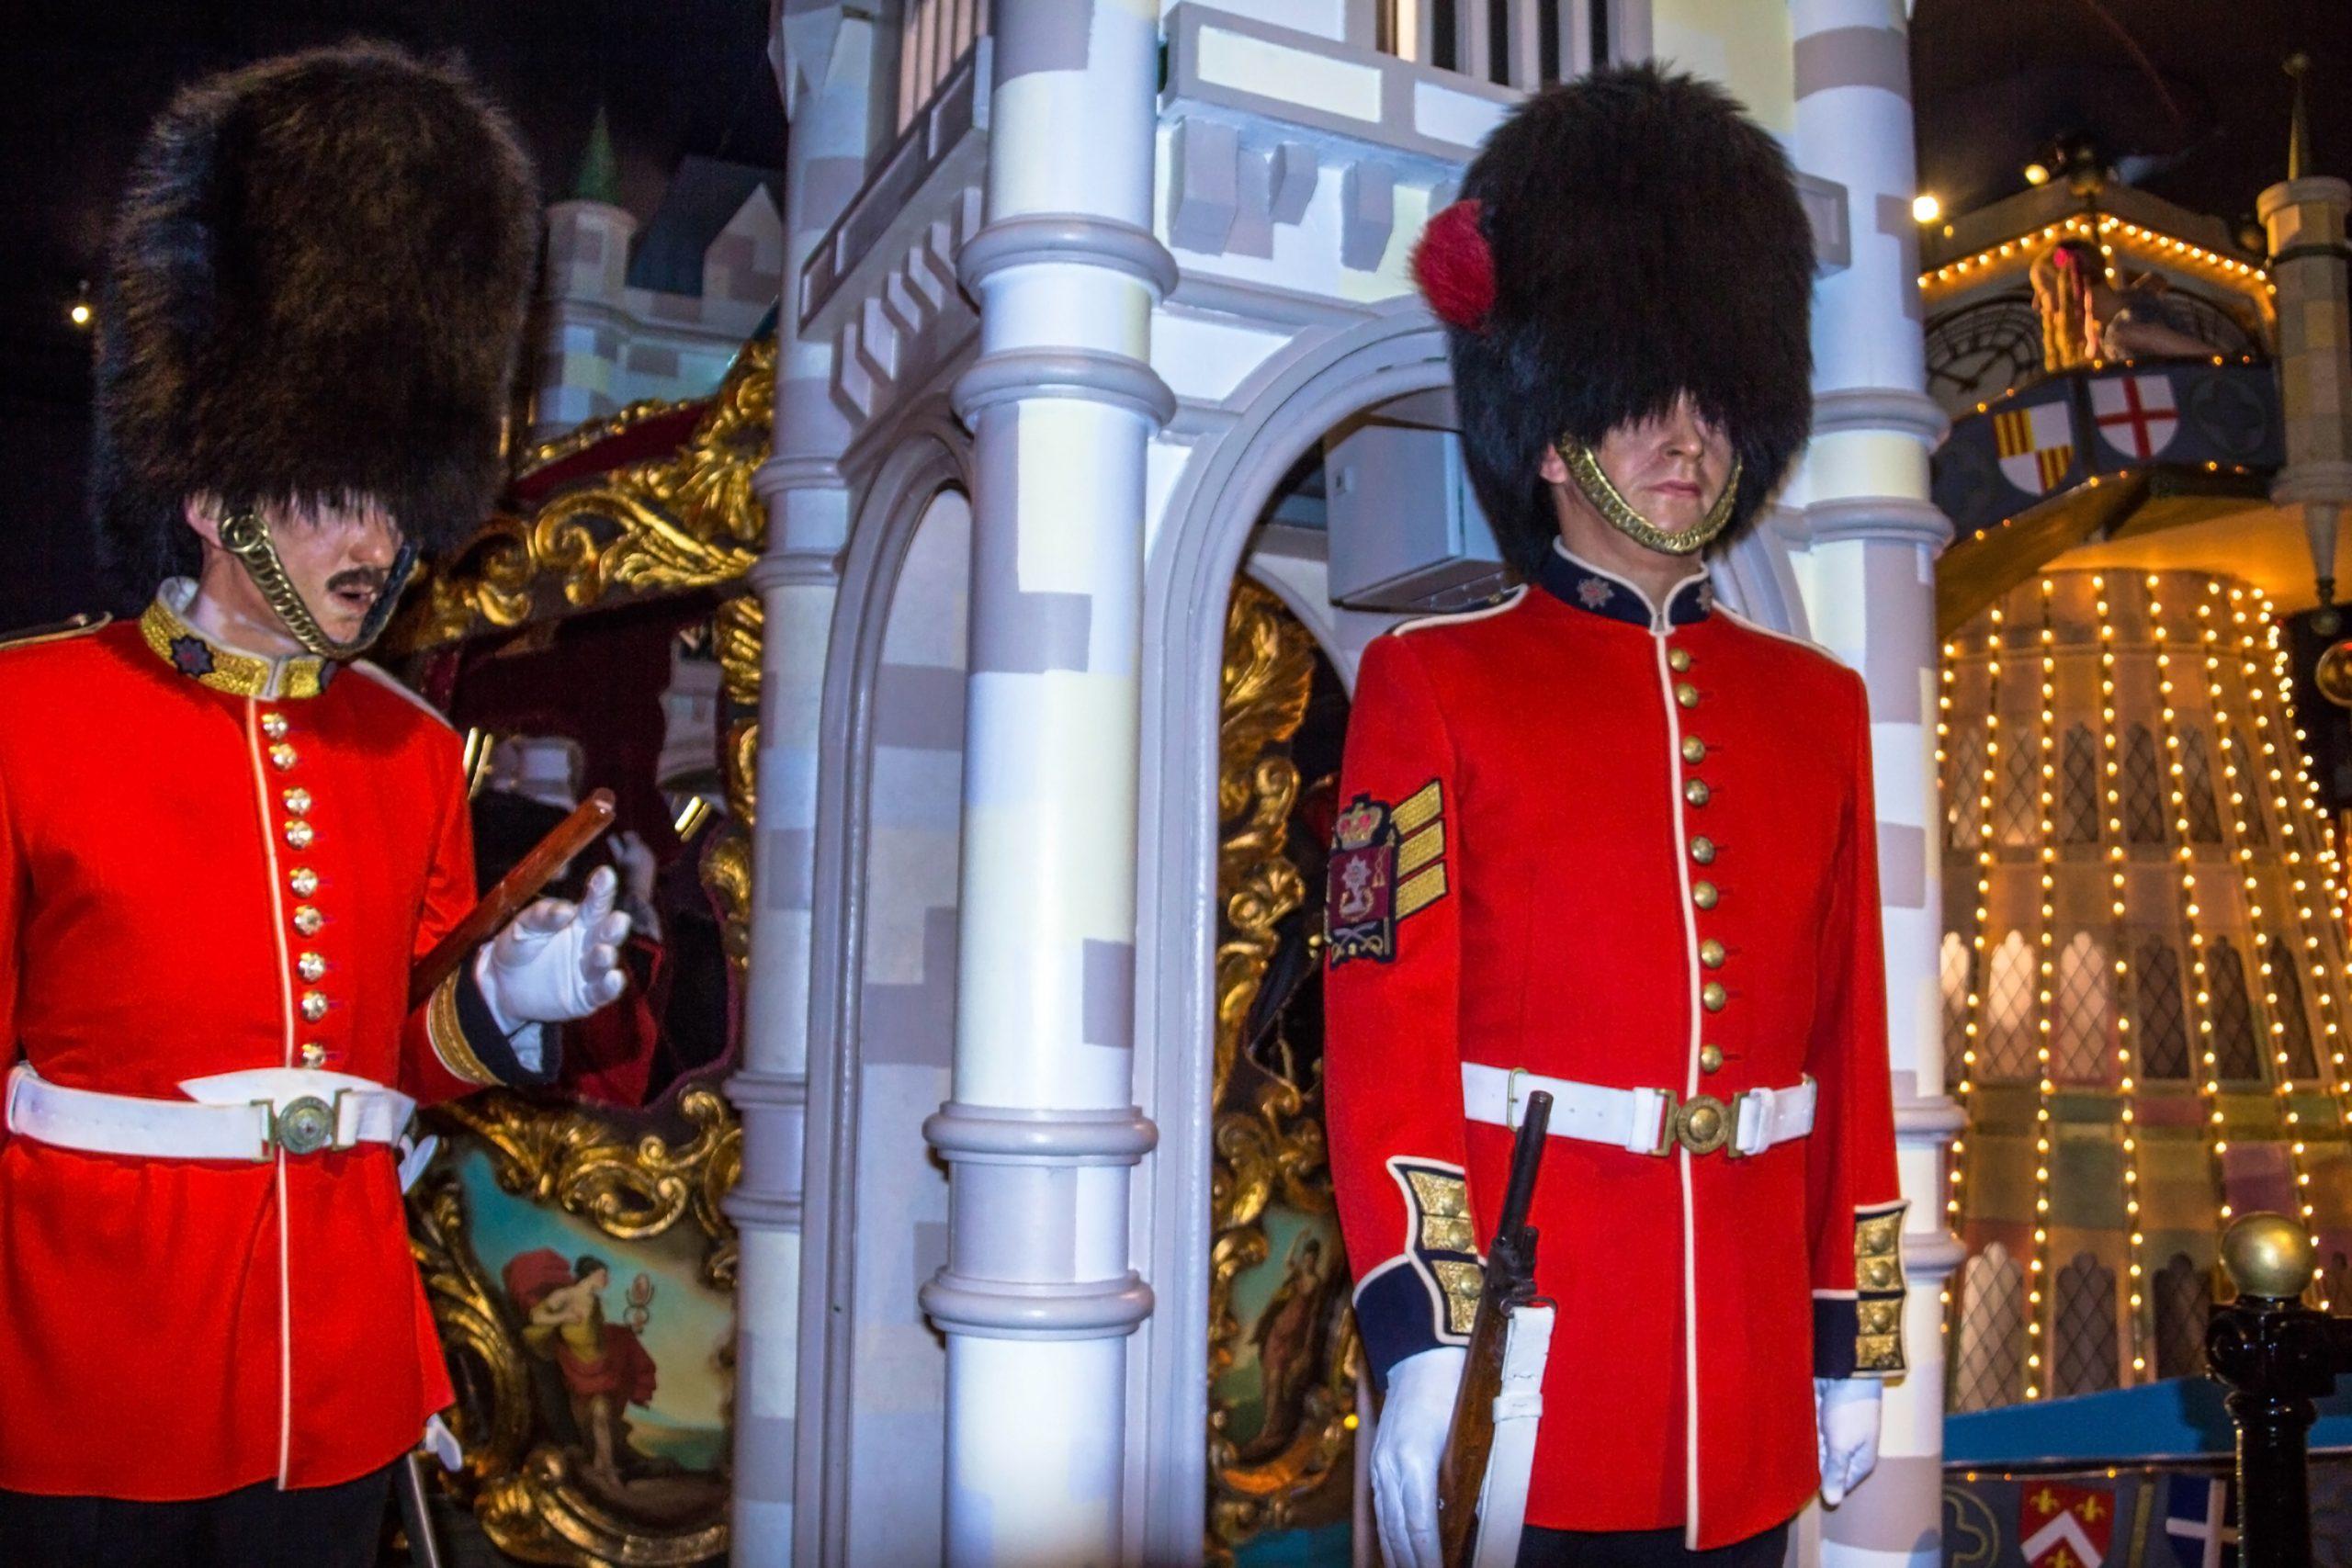 British Guards in Madame Tussauds